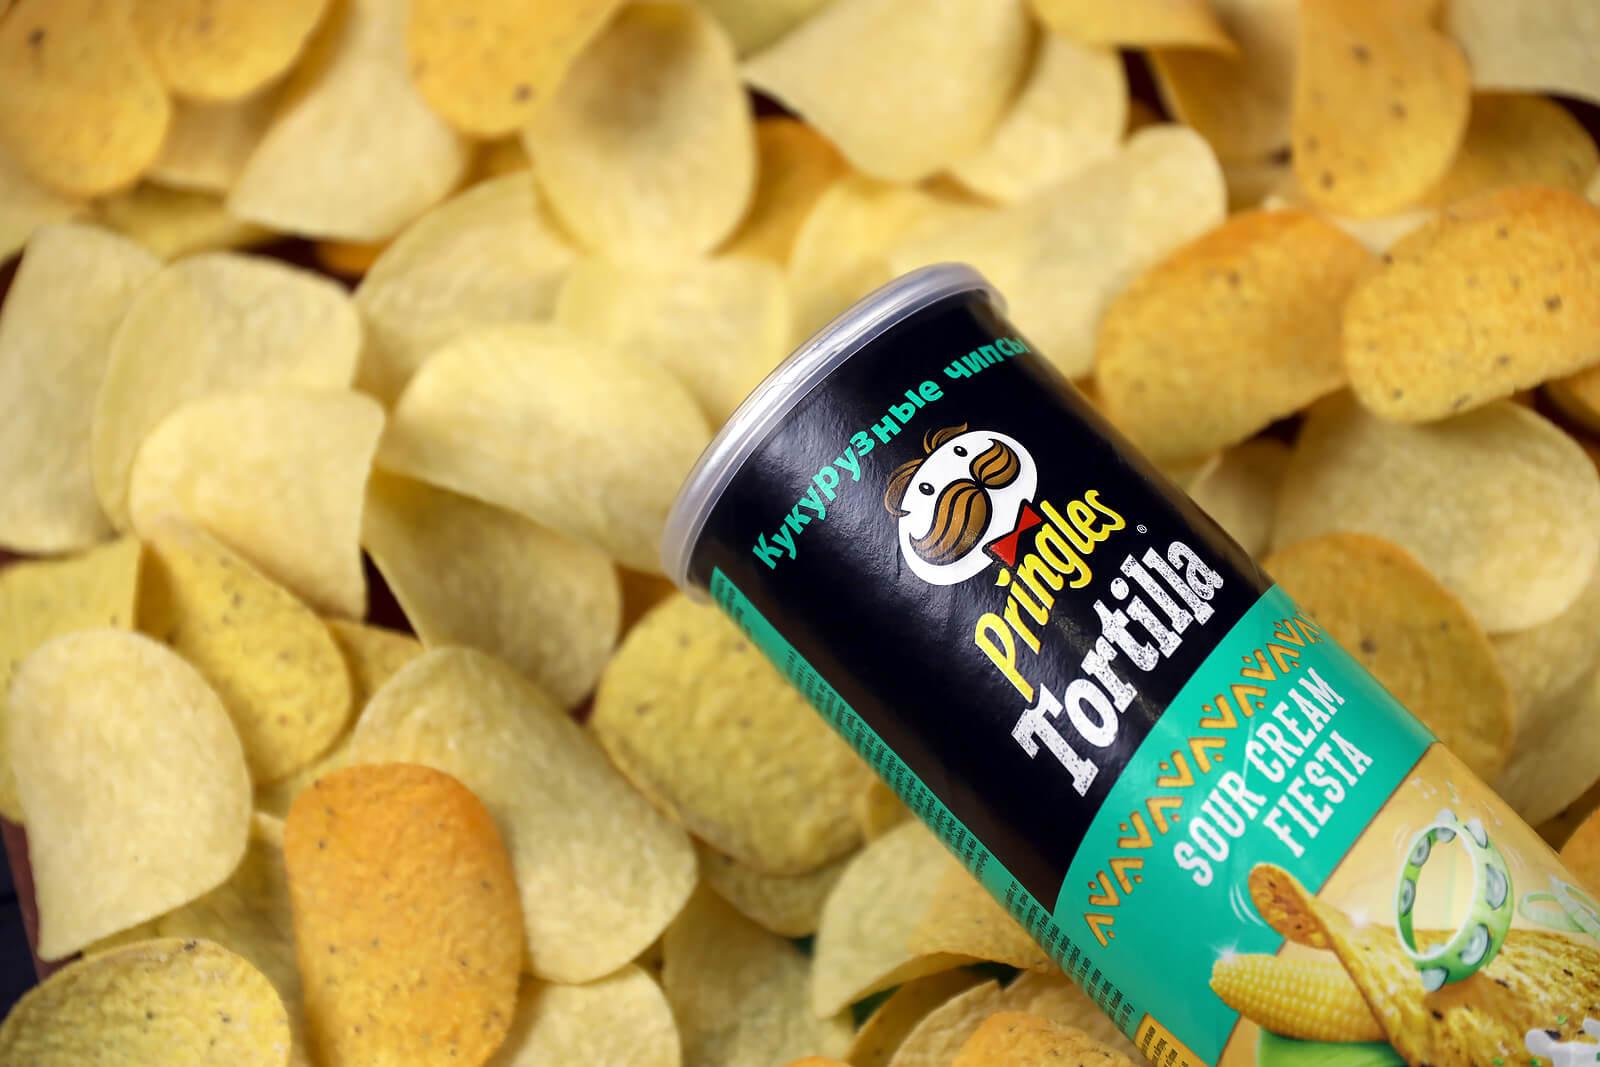 A tube of tortilla pringles lays across a golden bed of crisps.